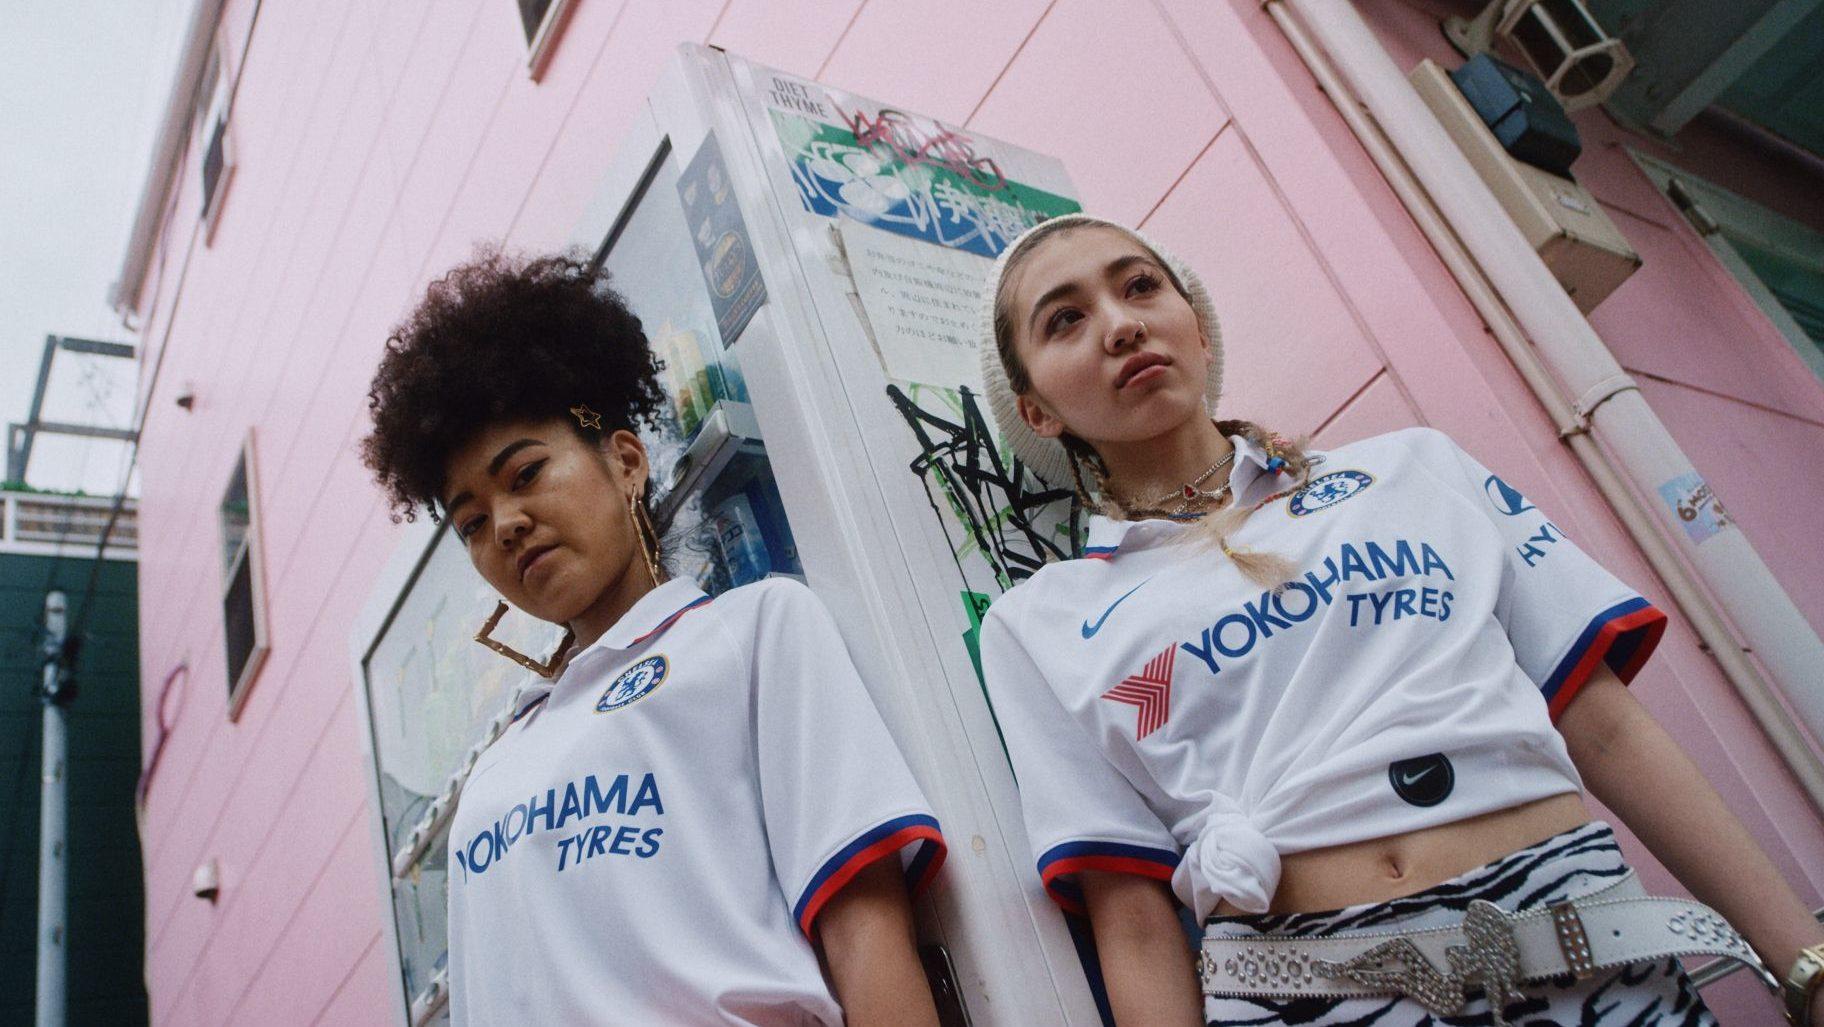 Chelsea – Tokyo x Nike